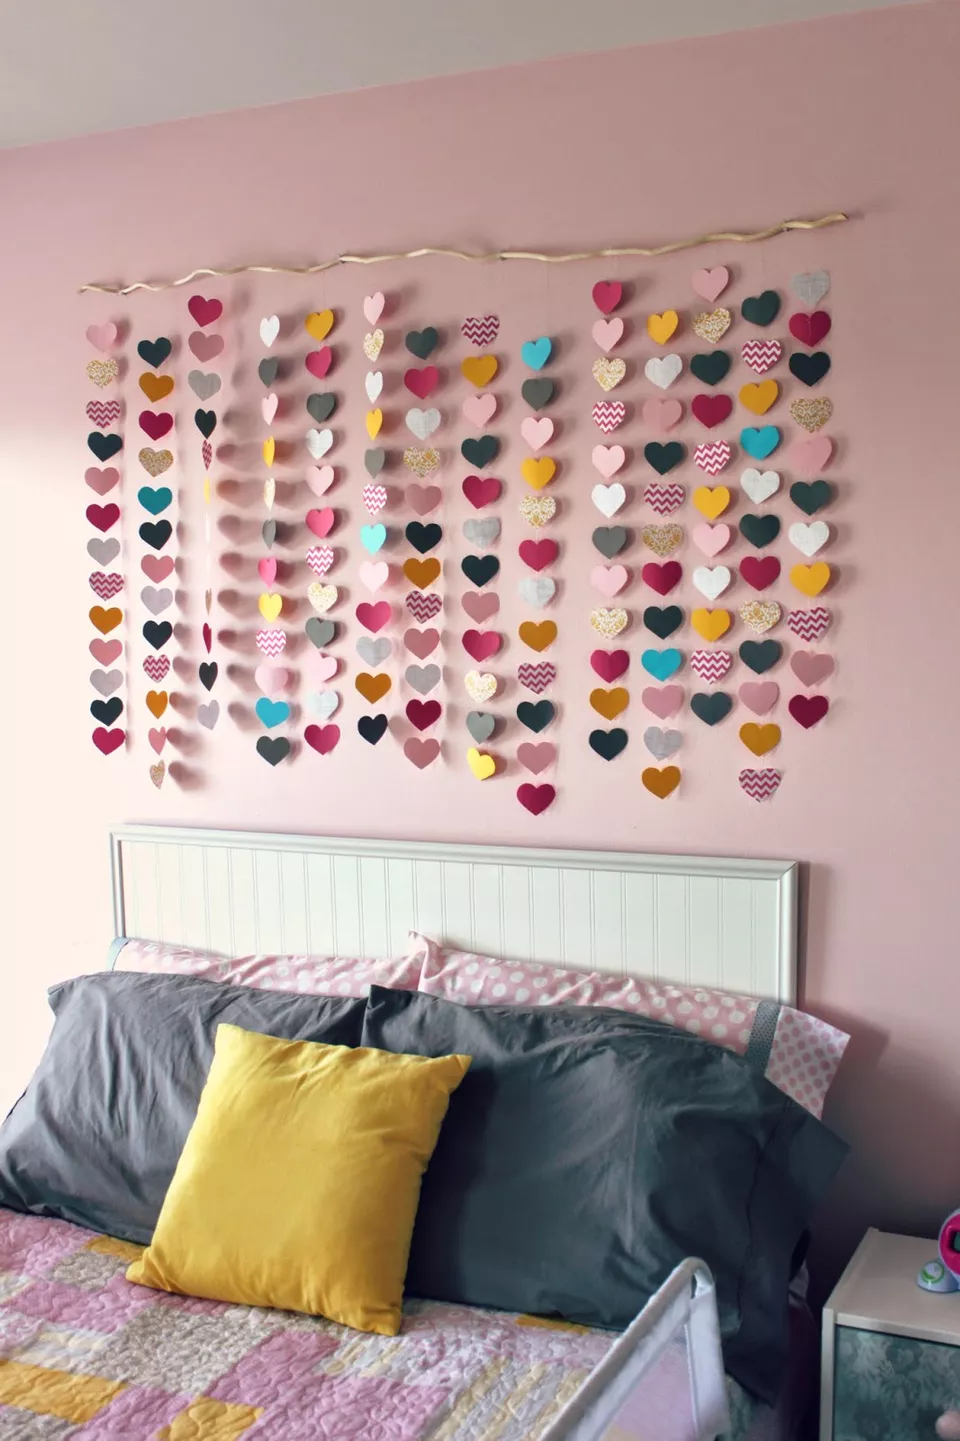 24 Wall Decor Ideas For Girls Rooms Diy Room Decor Diy Bedroom